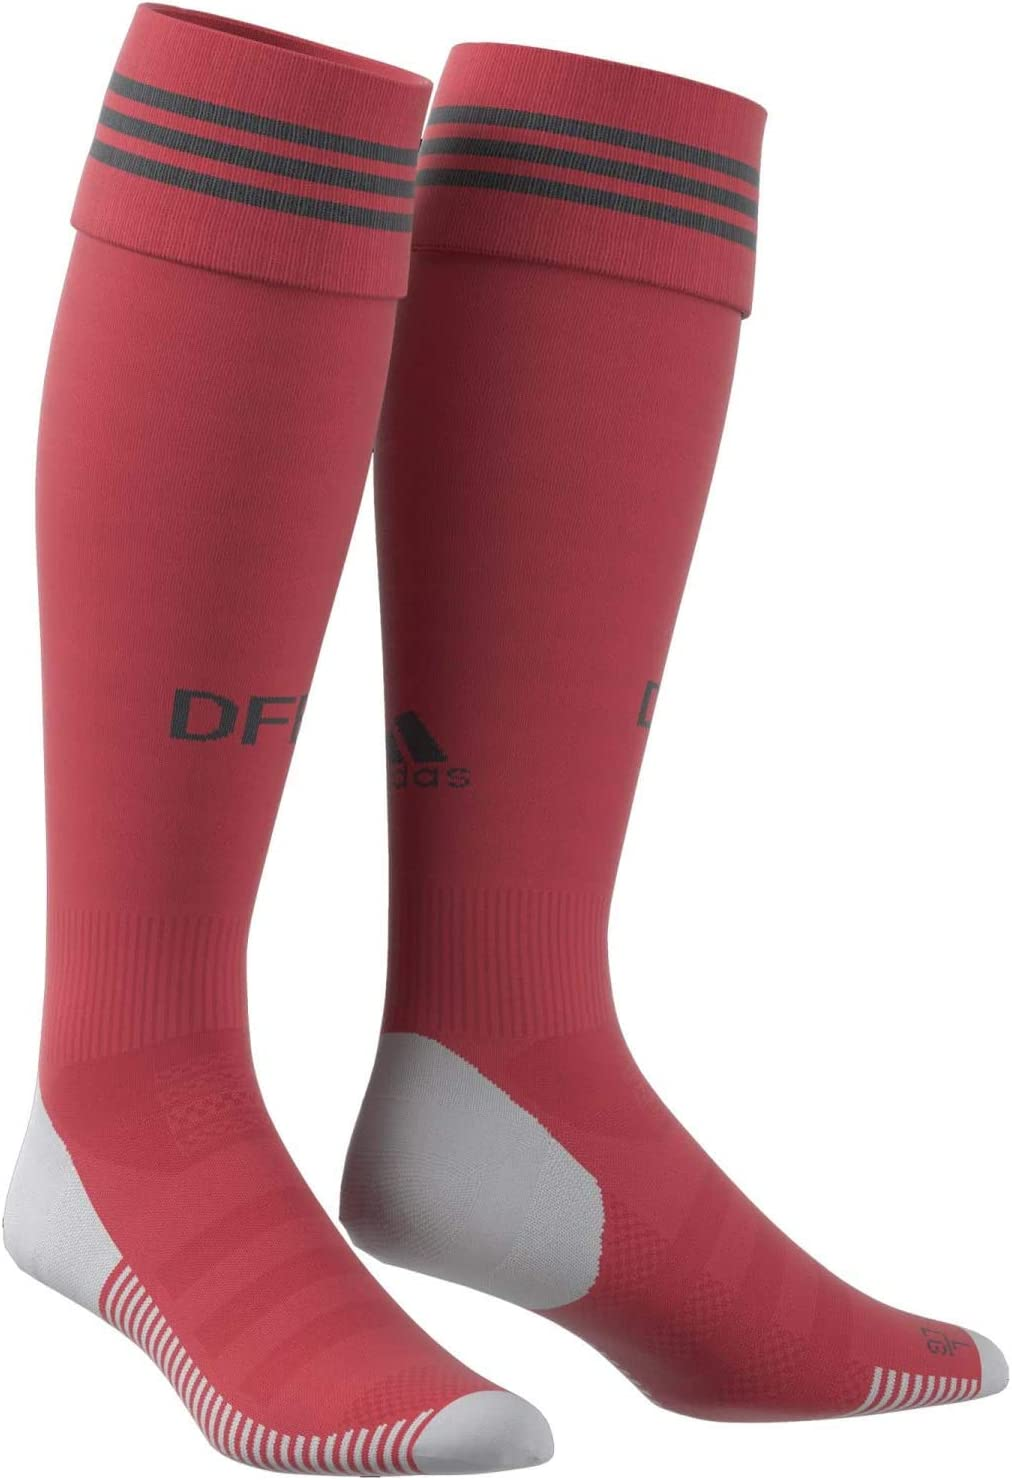 Hombre adidas DFB Gk Fbol Calcetines de Portero de F/útbol